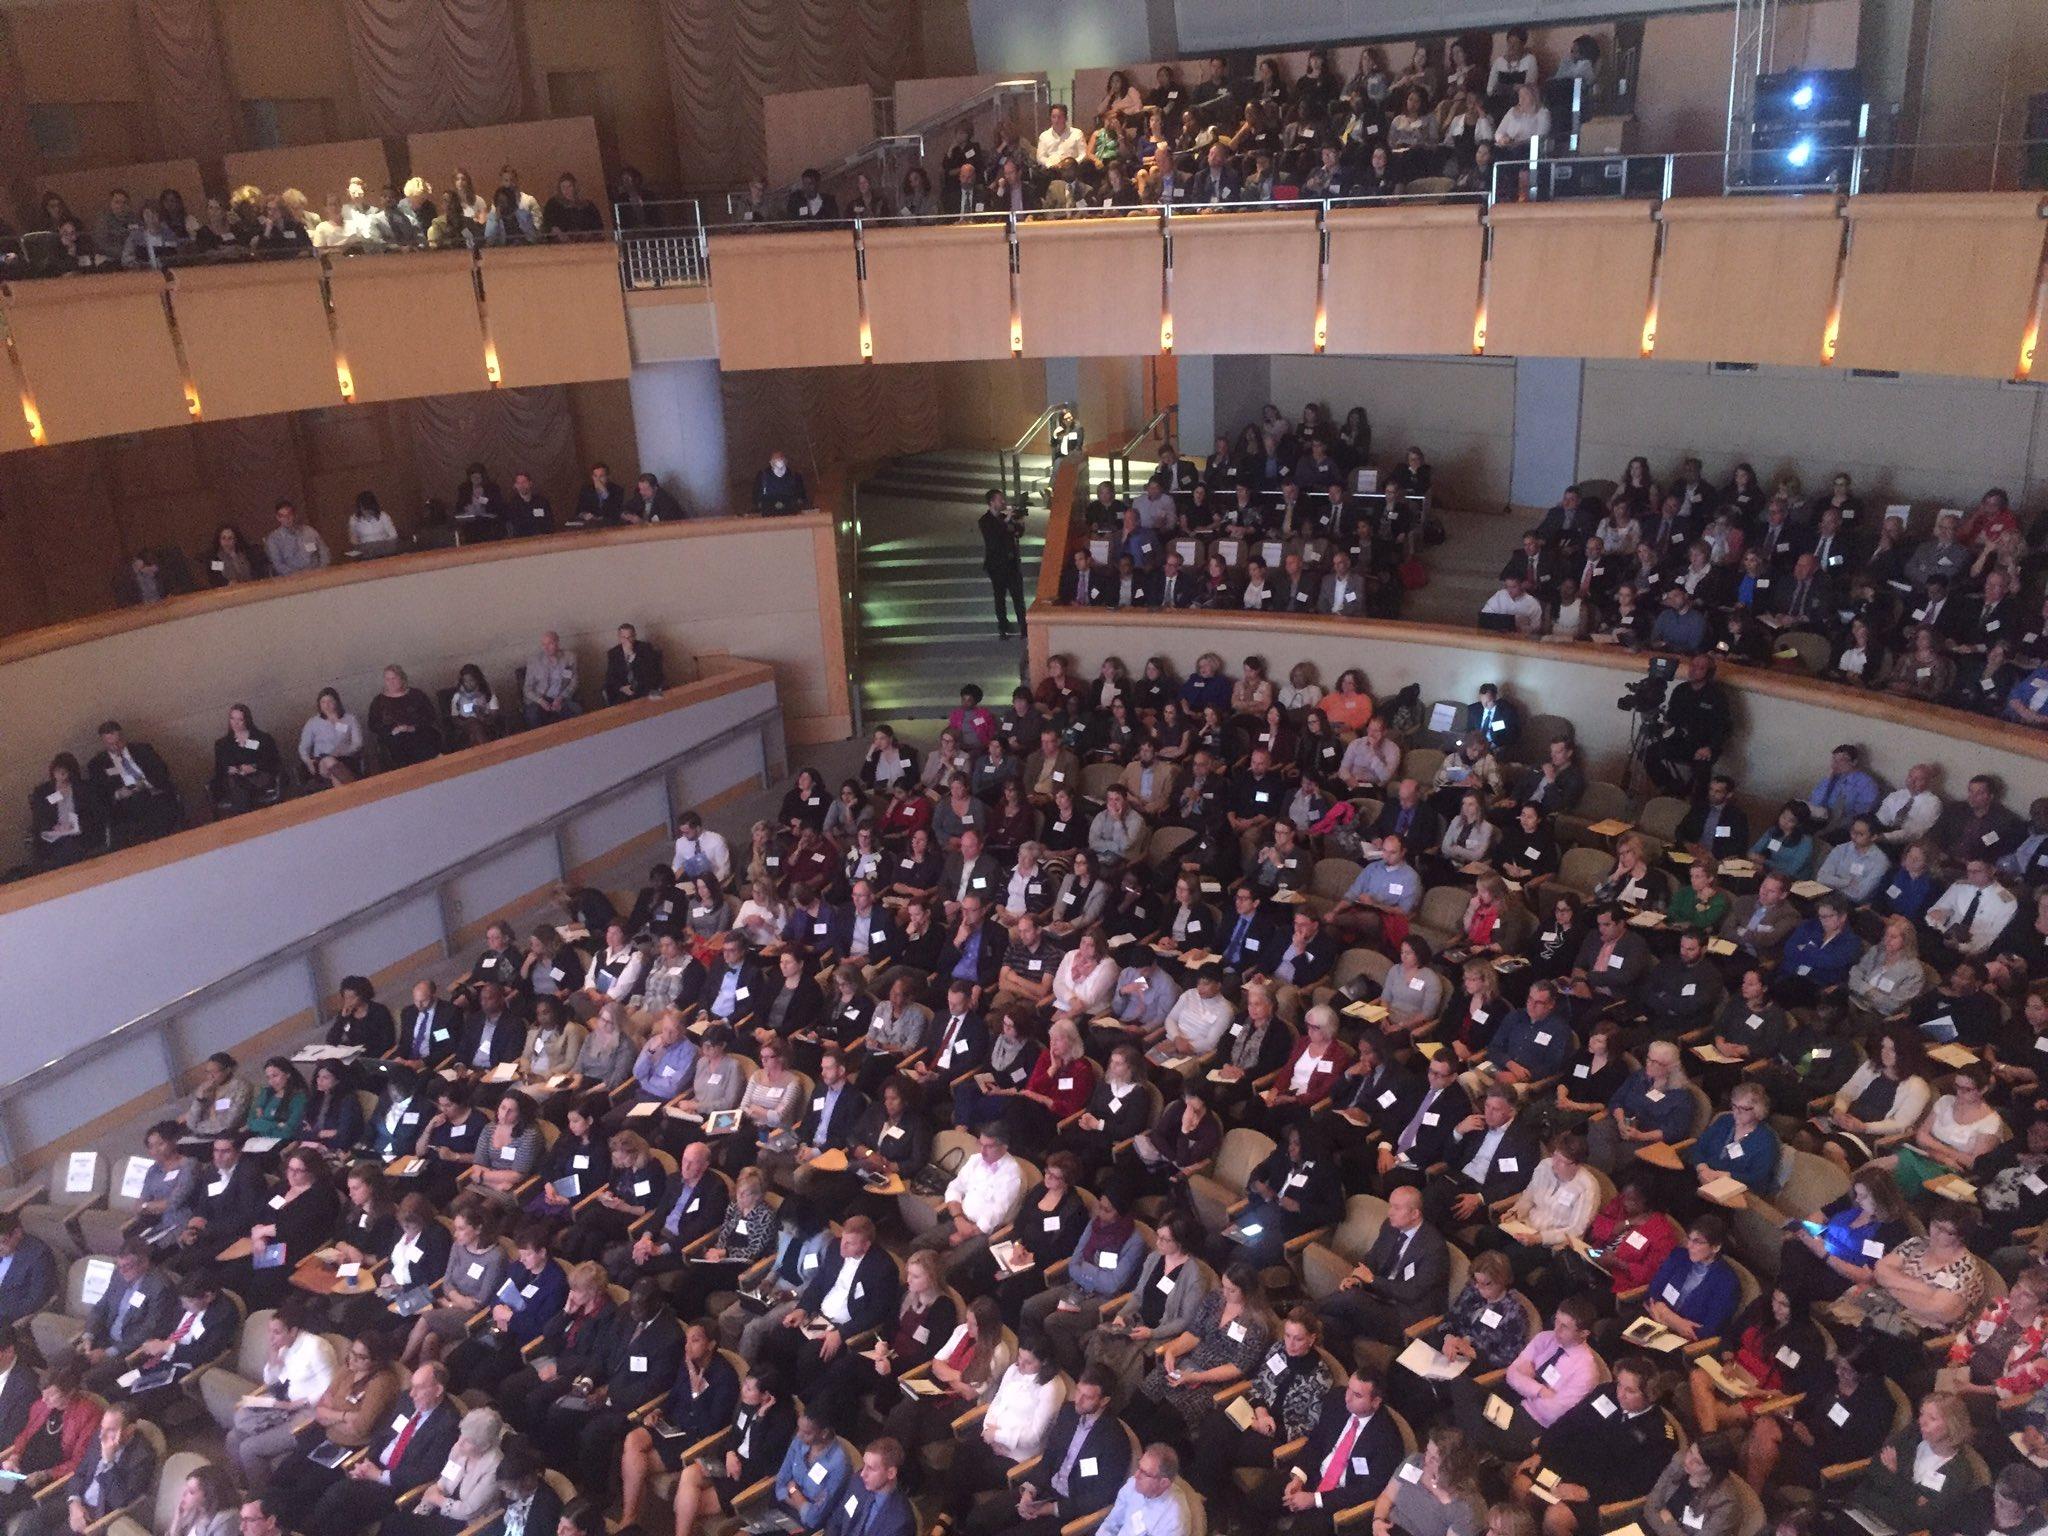 Full house at #QT2016 https://t.co/I8DcQYR1eY